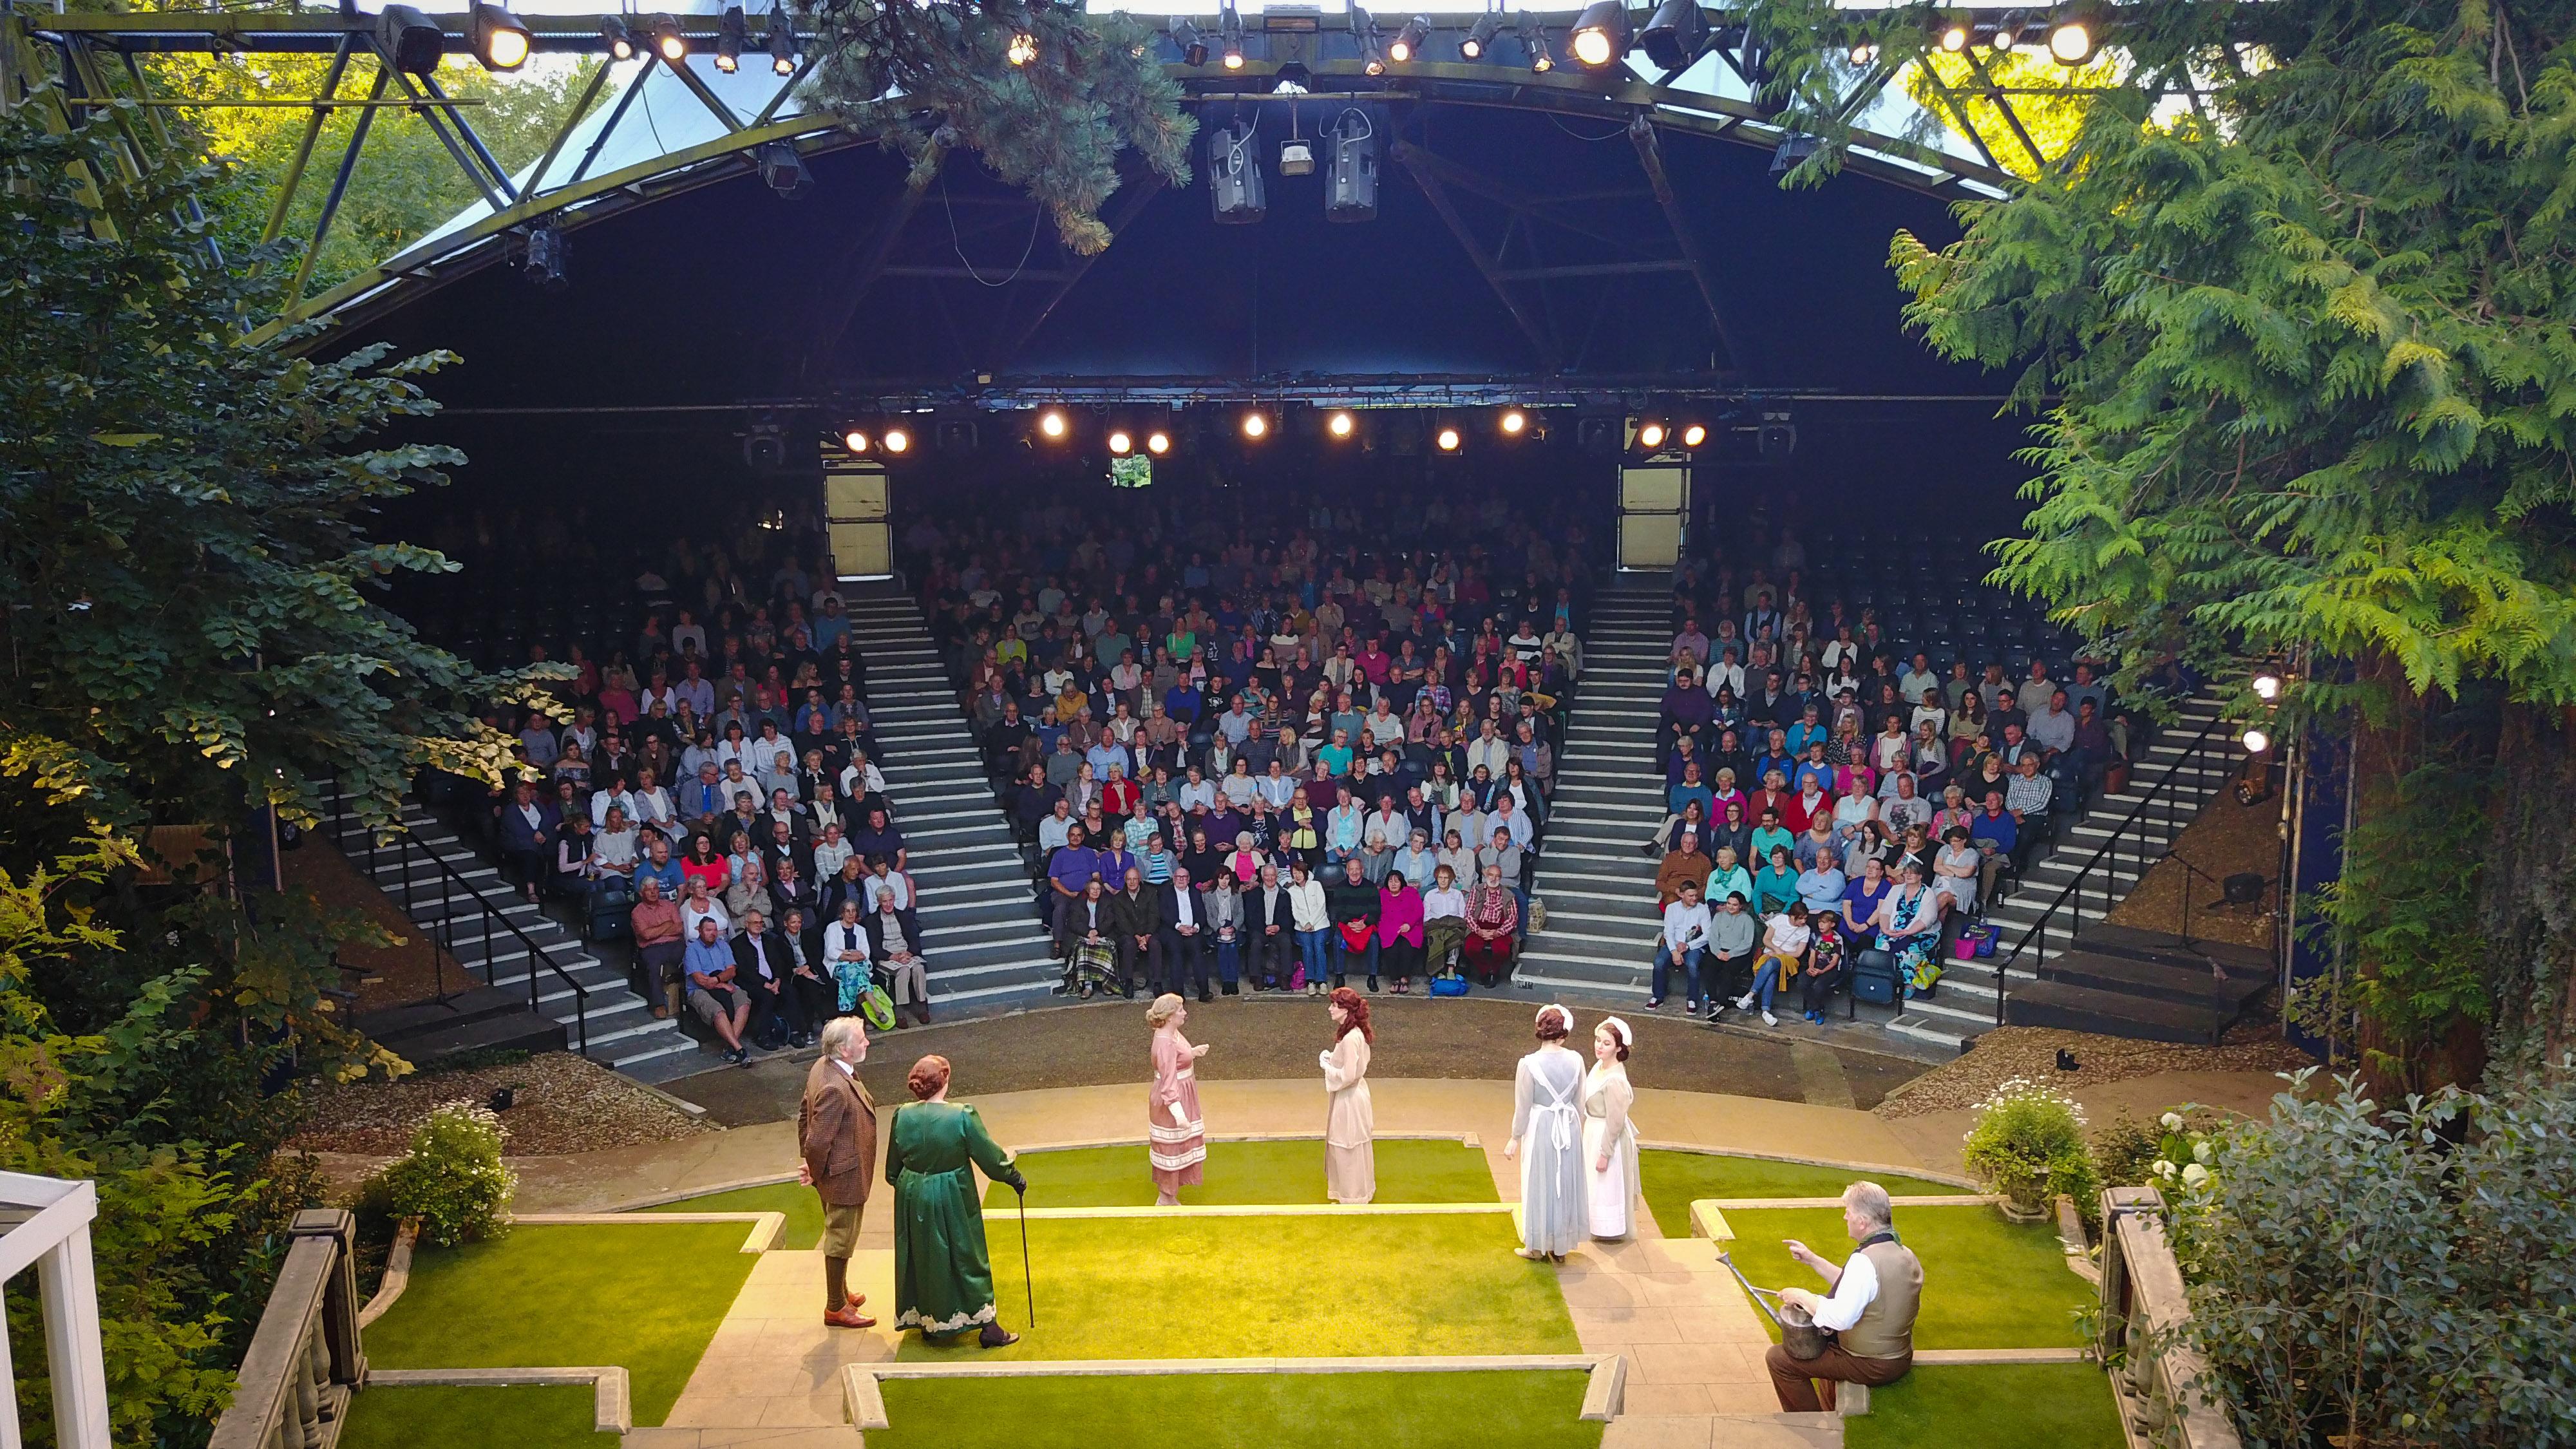 Tolethorpe Hall theatre